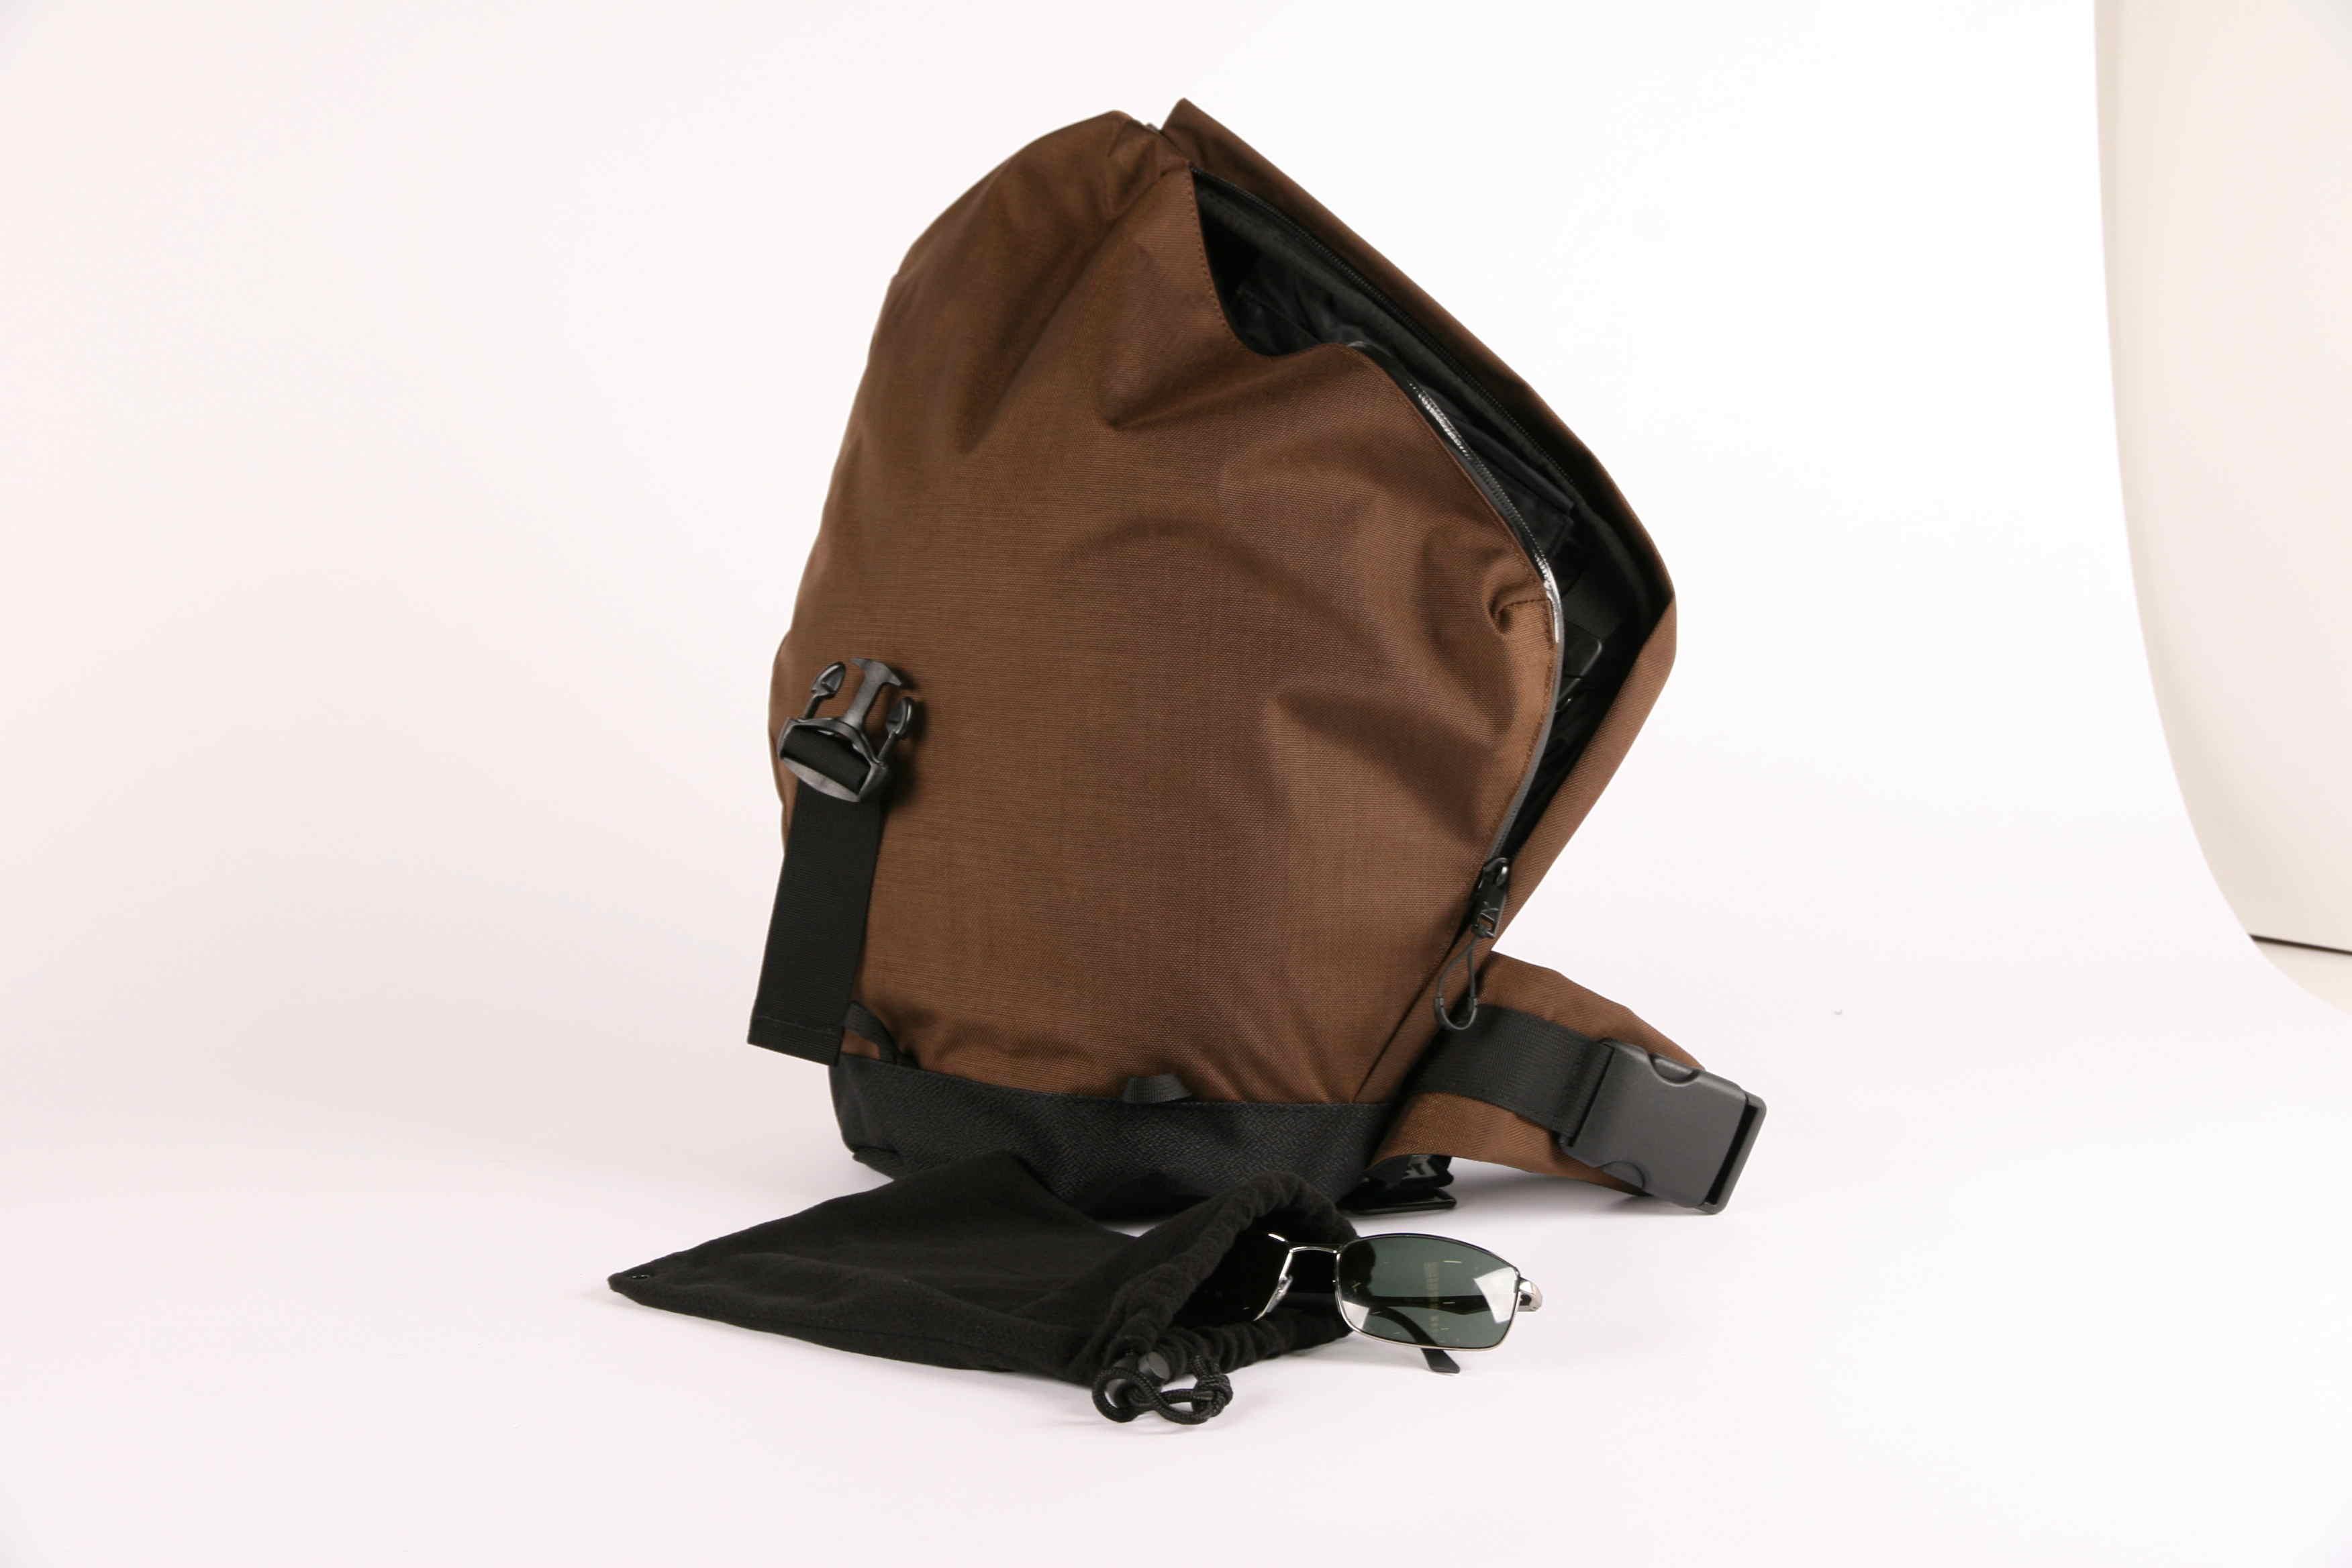 X-Over schuine rugzak sportsline wintersporst hoesje en tas